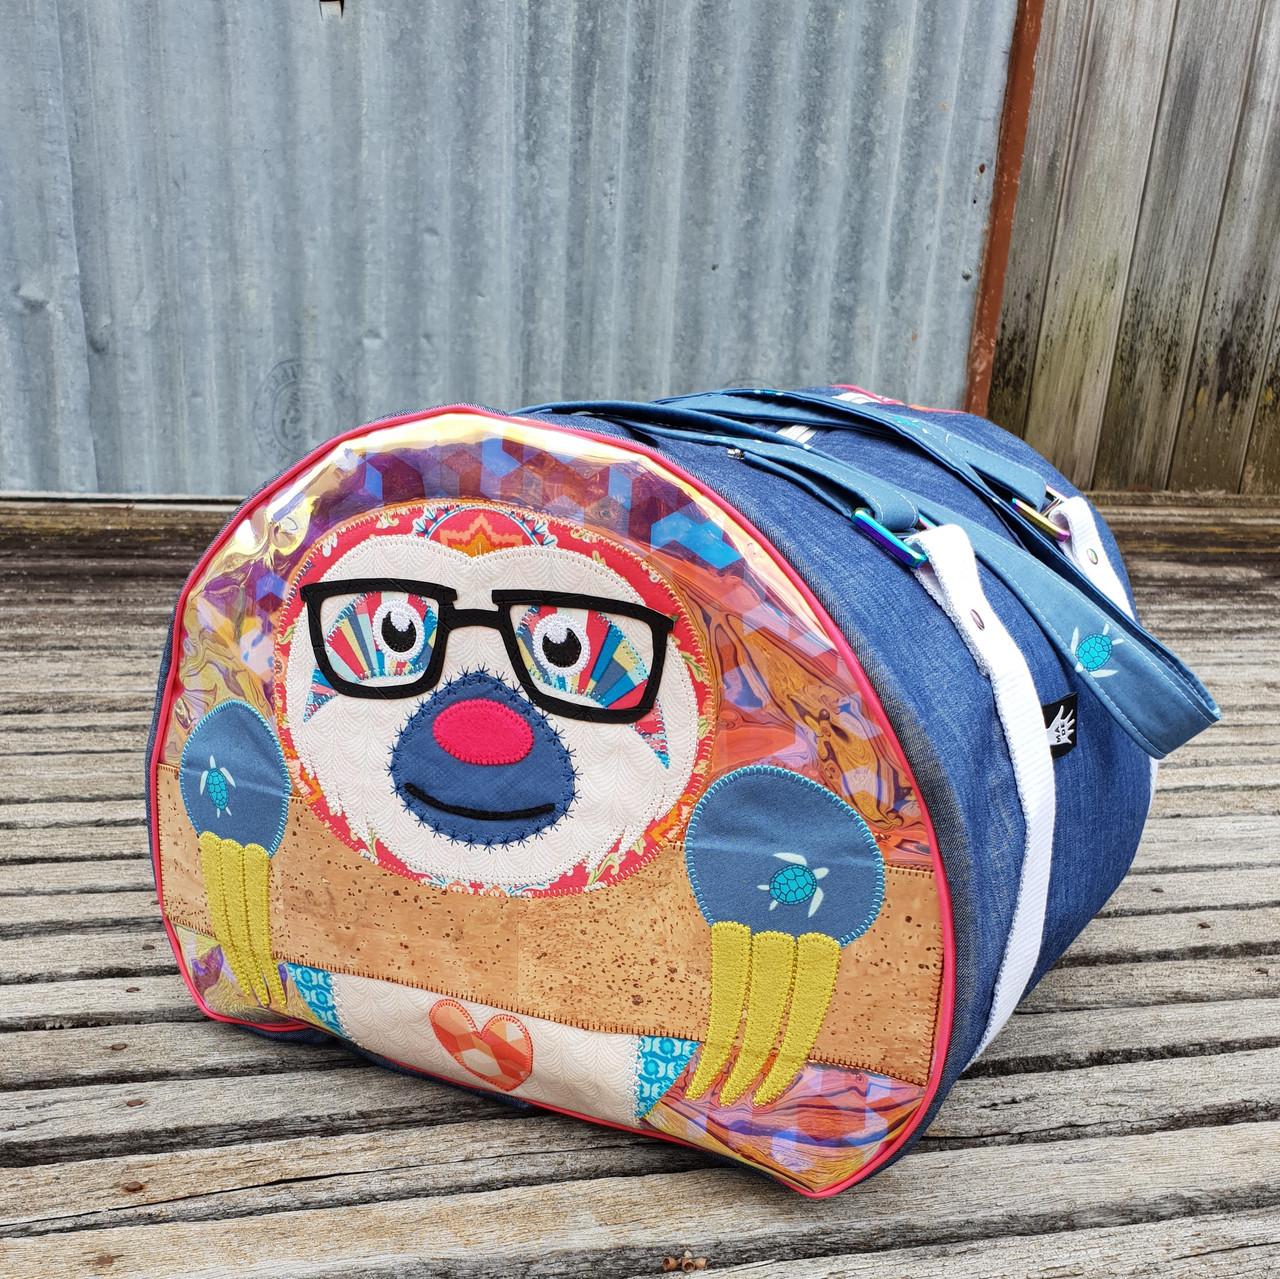 Cuddlee the sloth on little moo bag